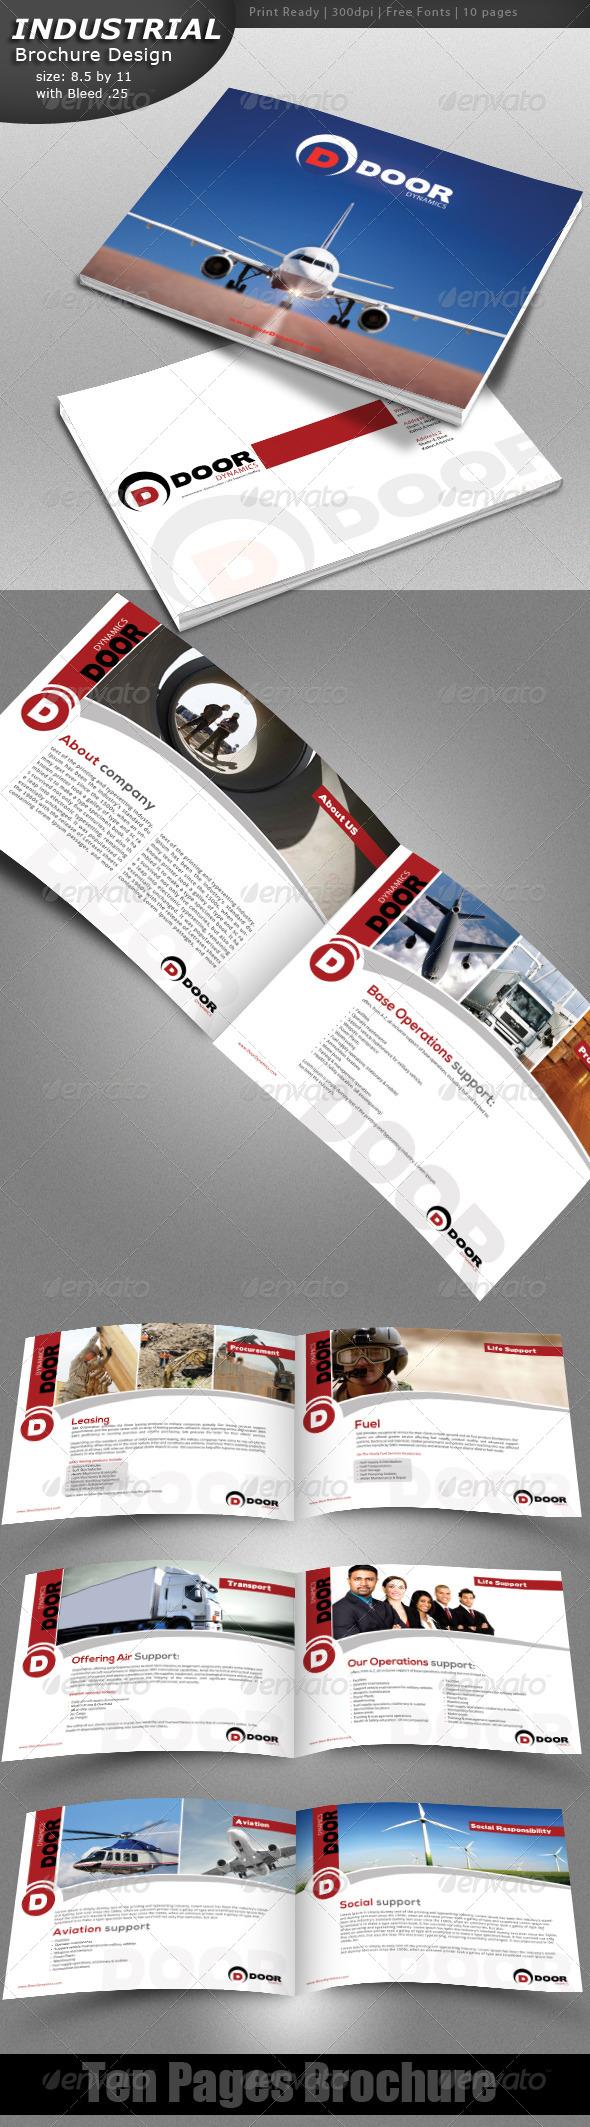 GraphicRiver Indestrial Brochure 4515194